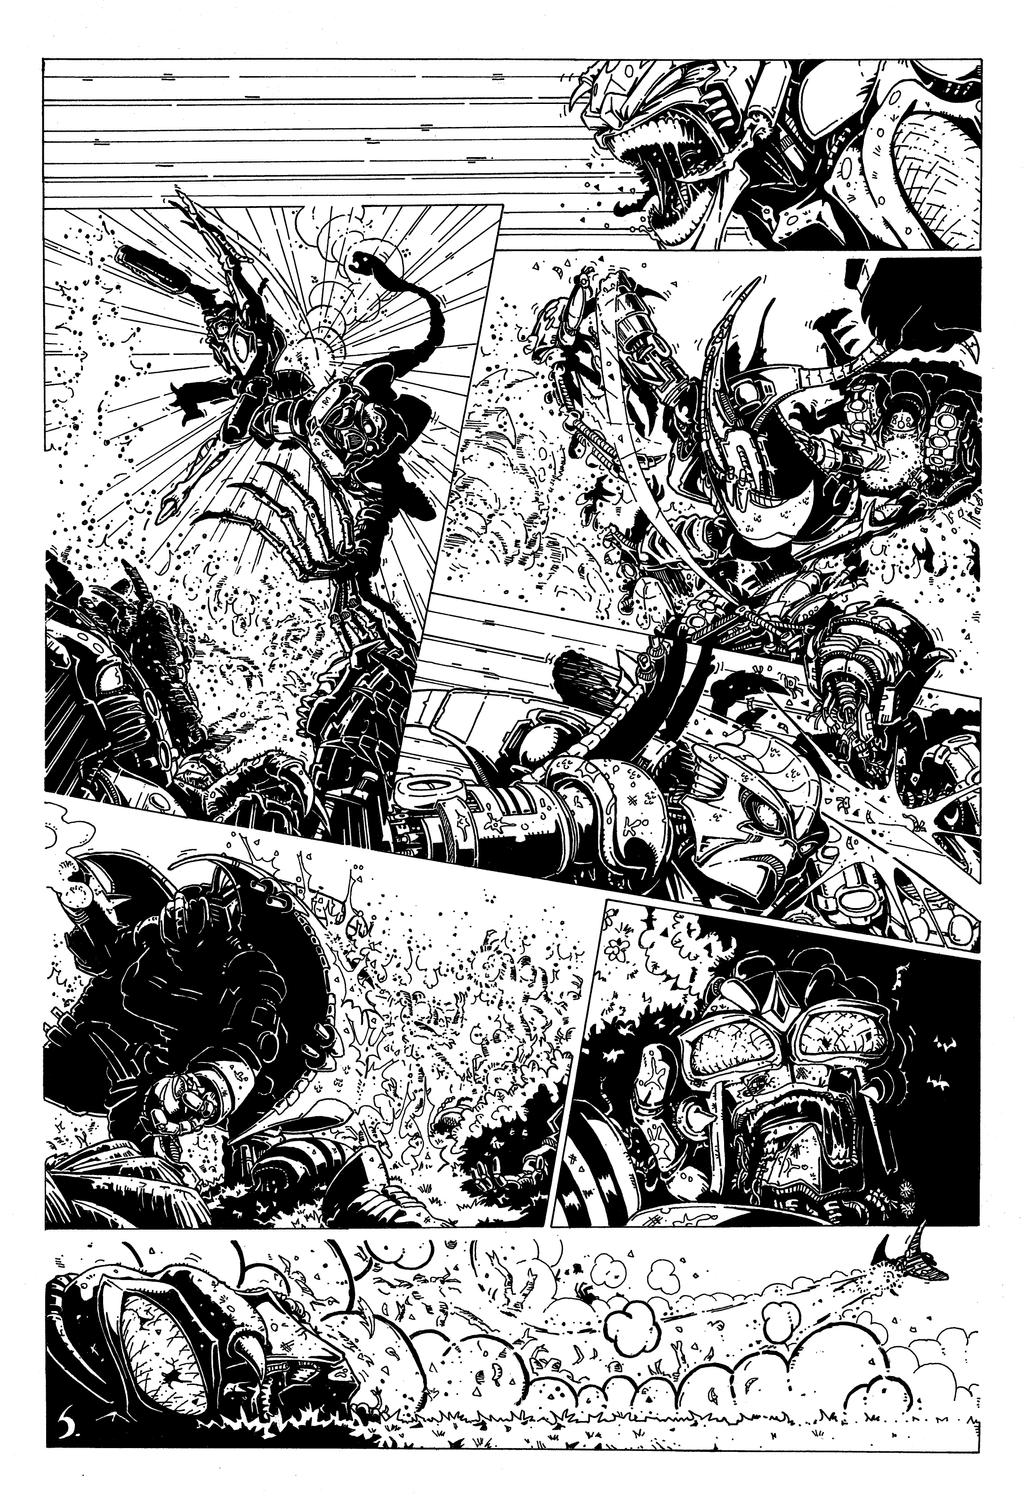 Fan Art i slicno - Page 5 Bw__sc_page_14___inks_by_divljasvinja-d38npli